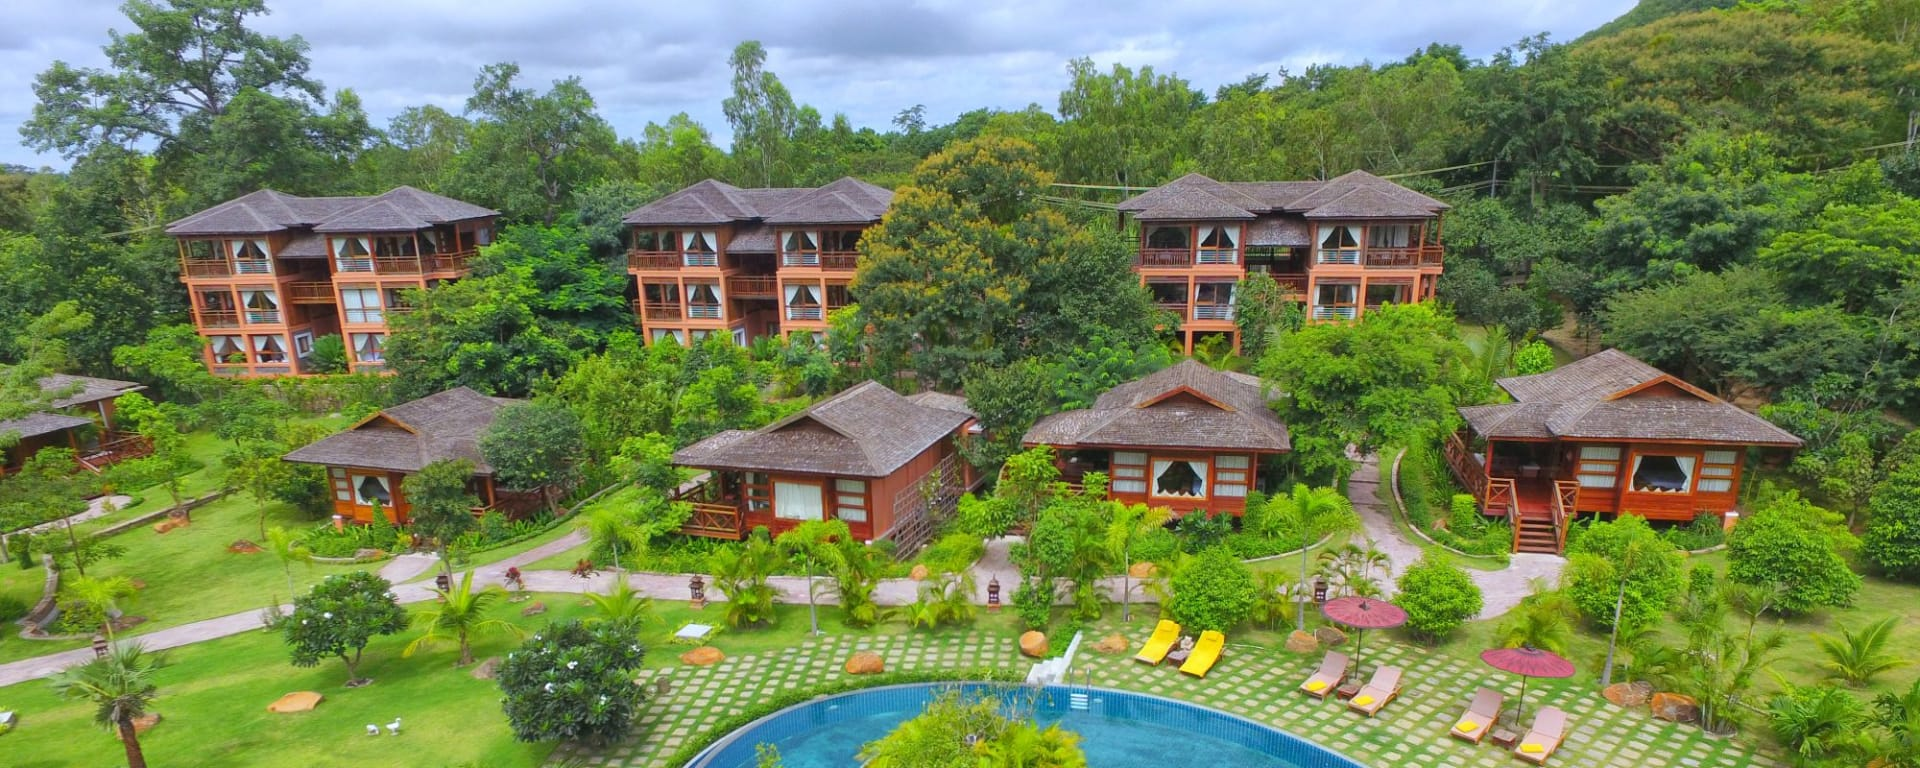 Popa Garden Resort à Bagan: Aerial View